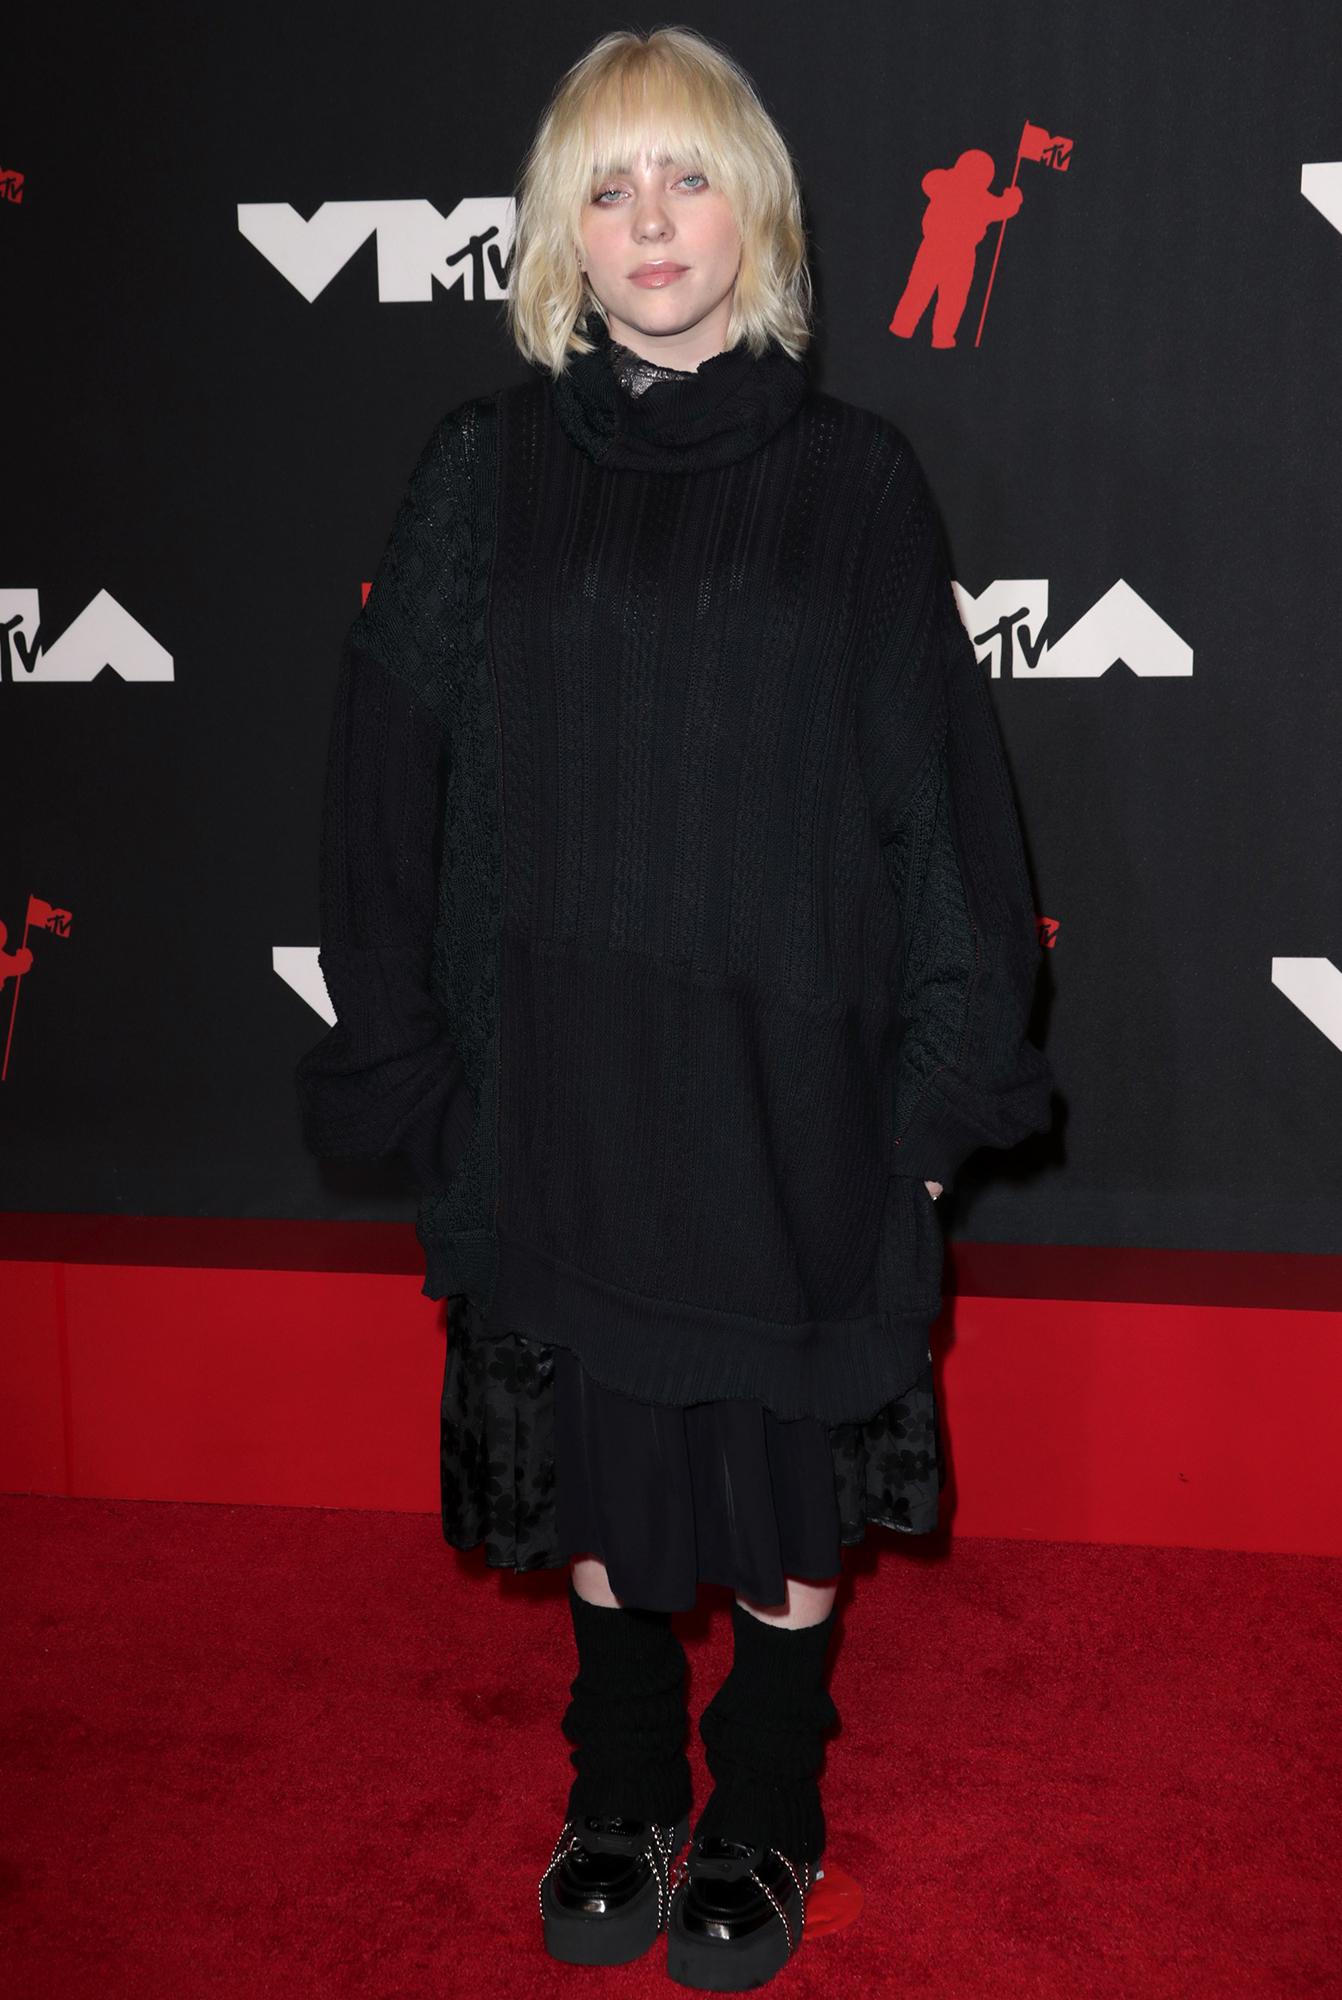 Billie Eilish arrives at the 2021 MTV Video Music Awards